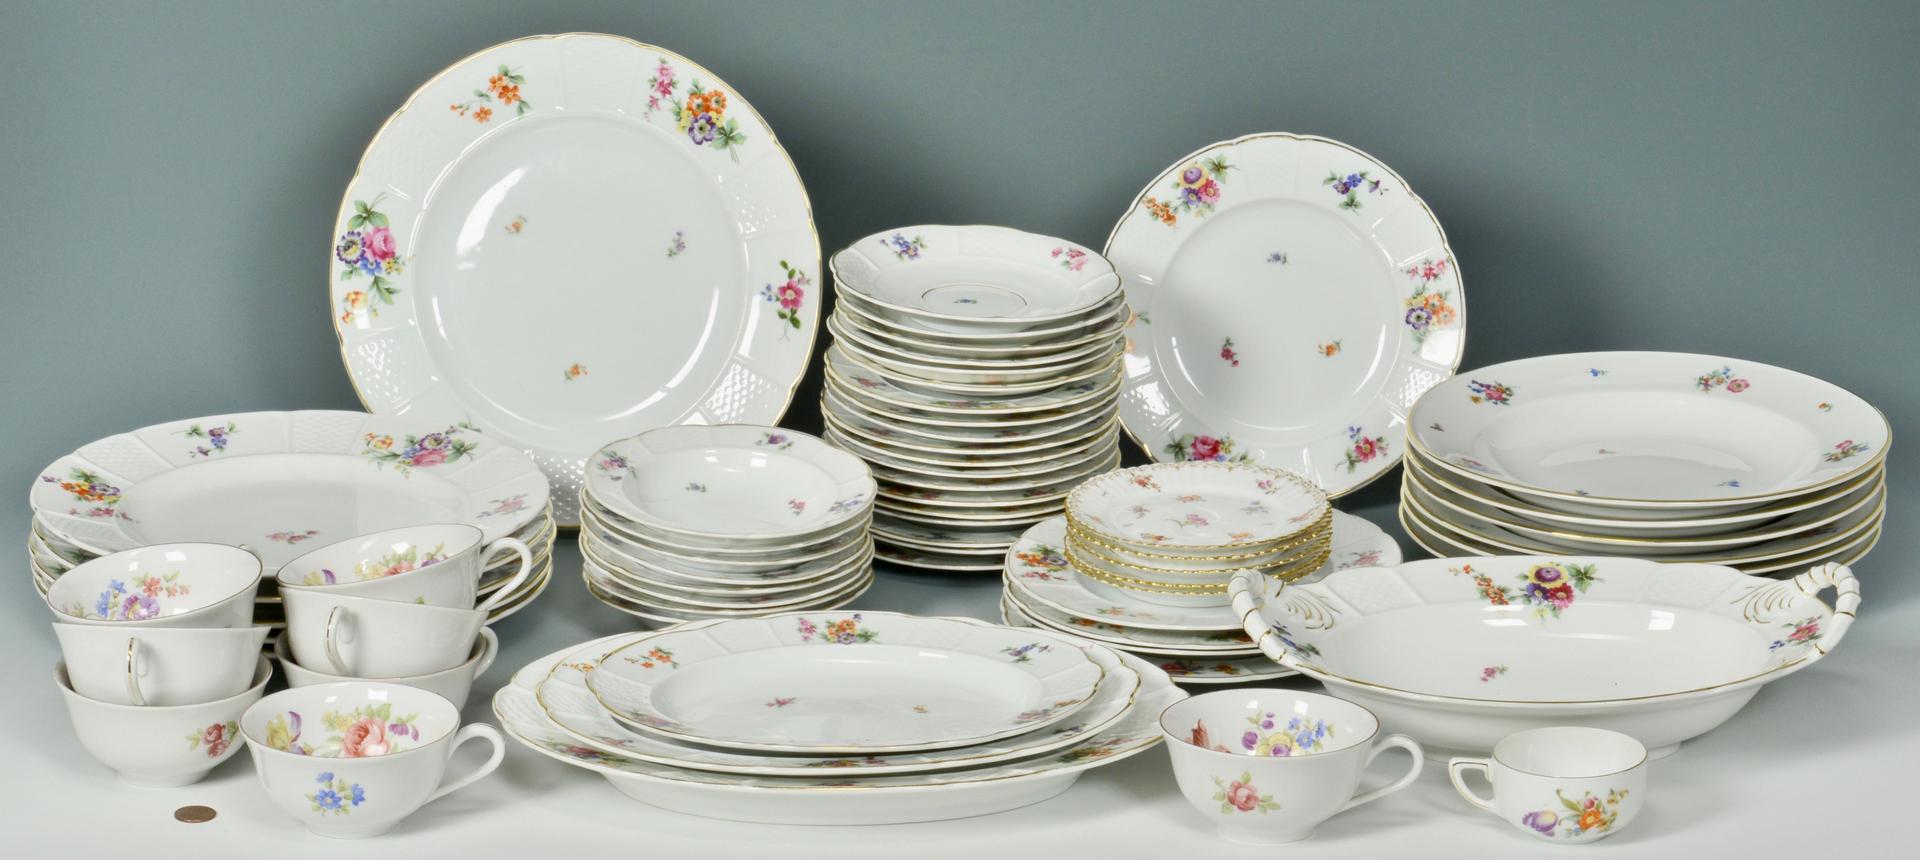 lot 3088355 rosenthal dinnerware service. Black Bedroom Furniture Sets. Home Design Ideas